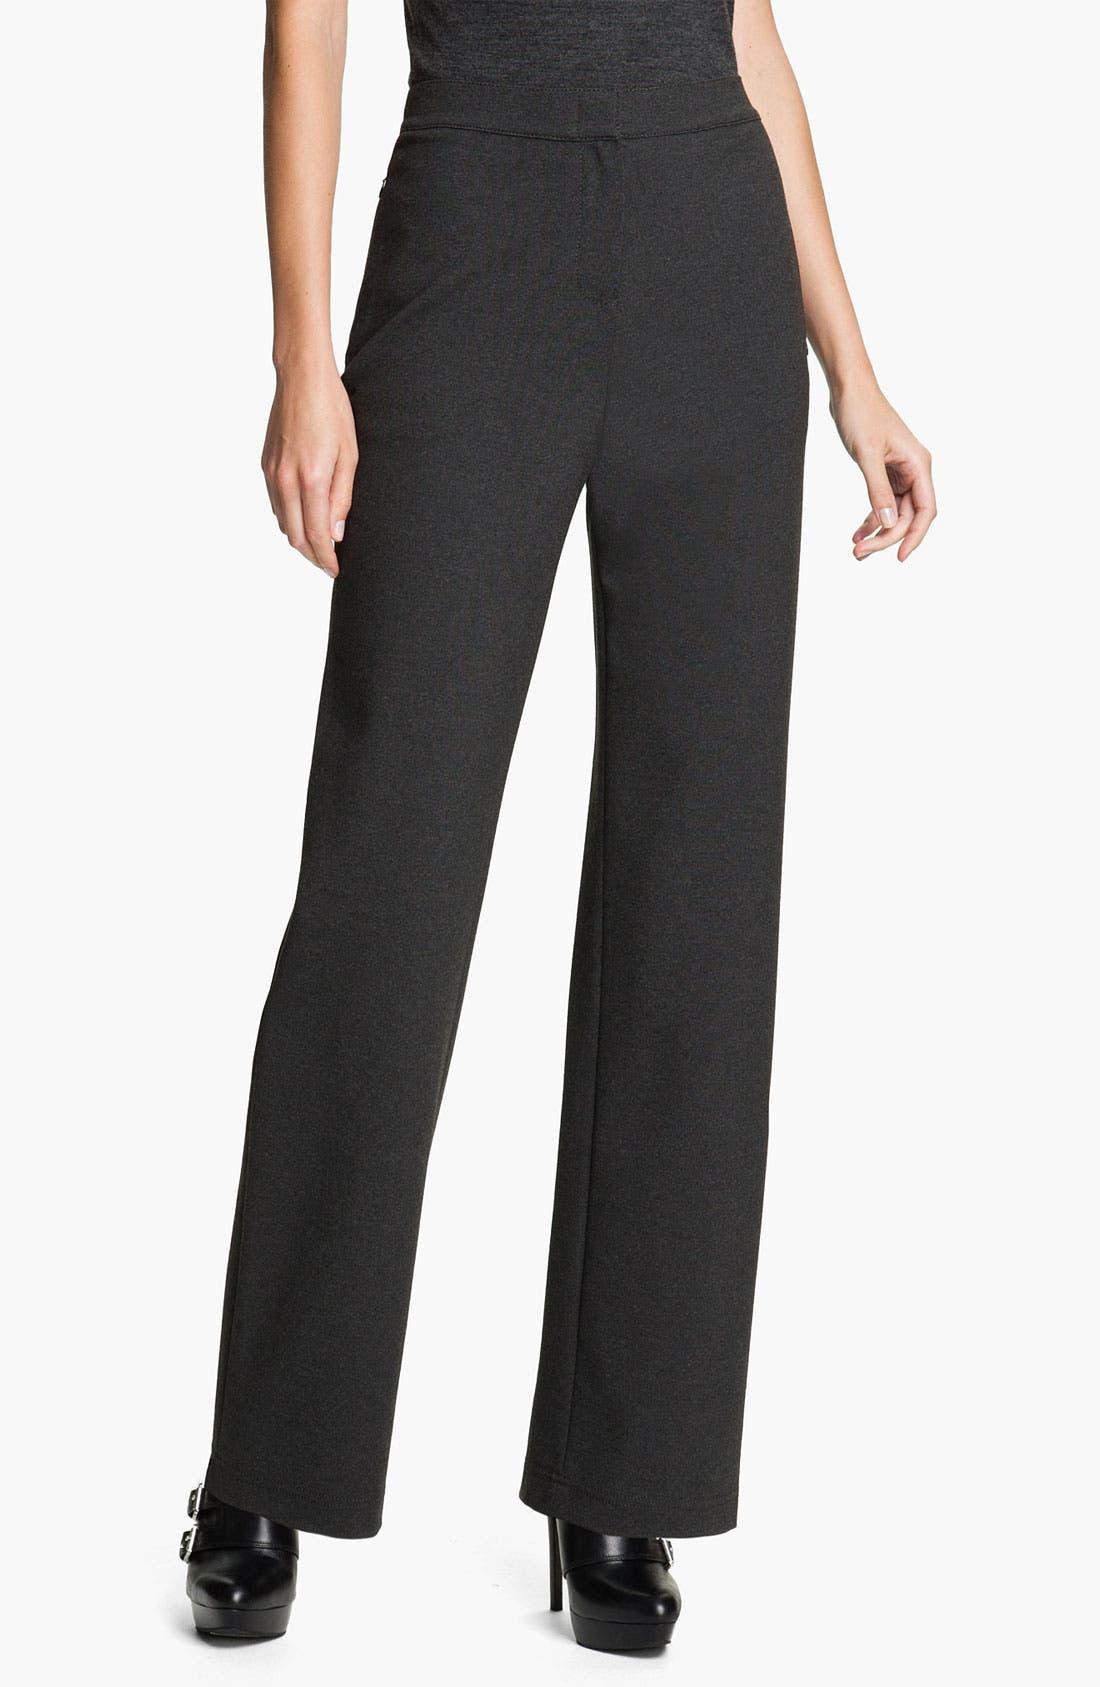 Alternate Image 1 Selected - Lafayette 148 New York Straight Leg Punto Milano Pants